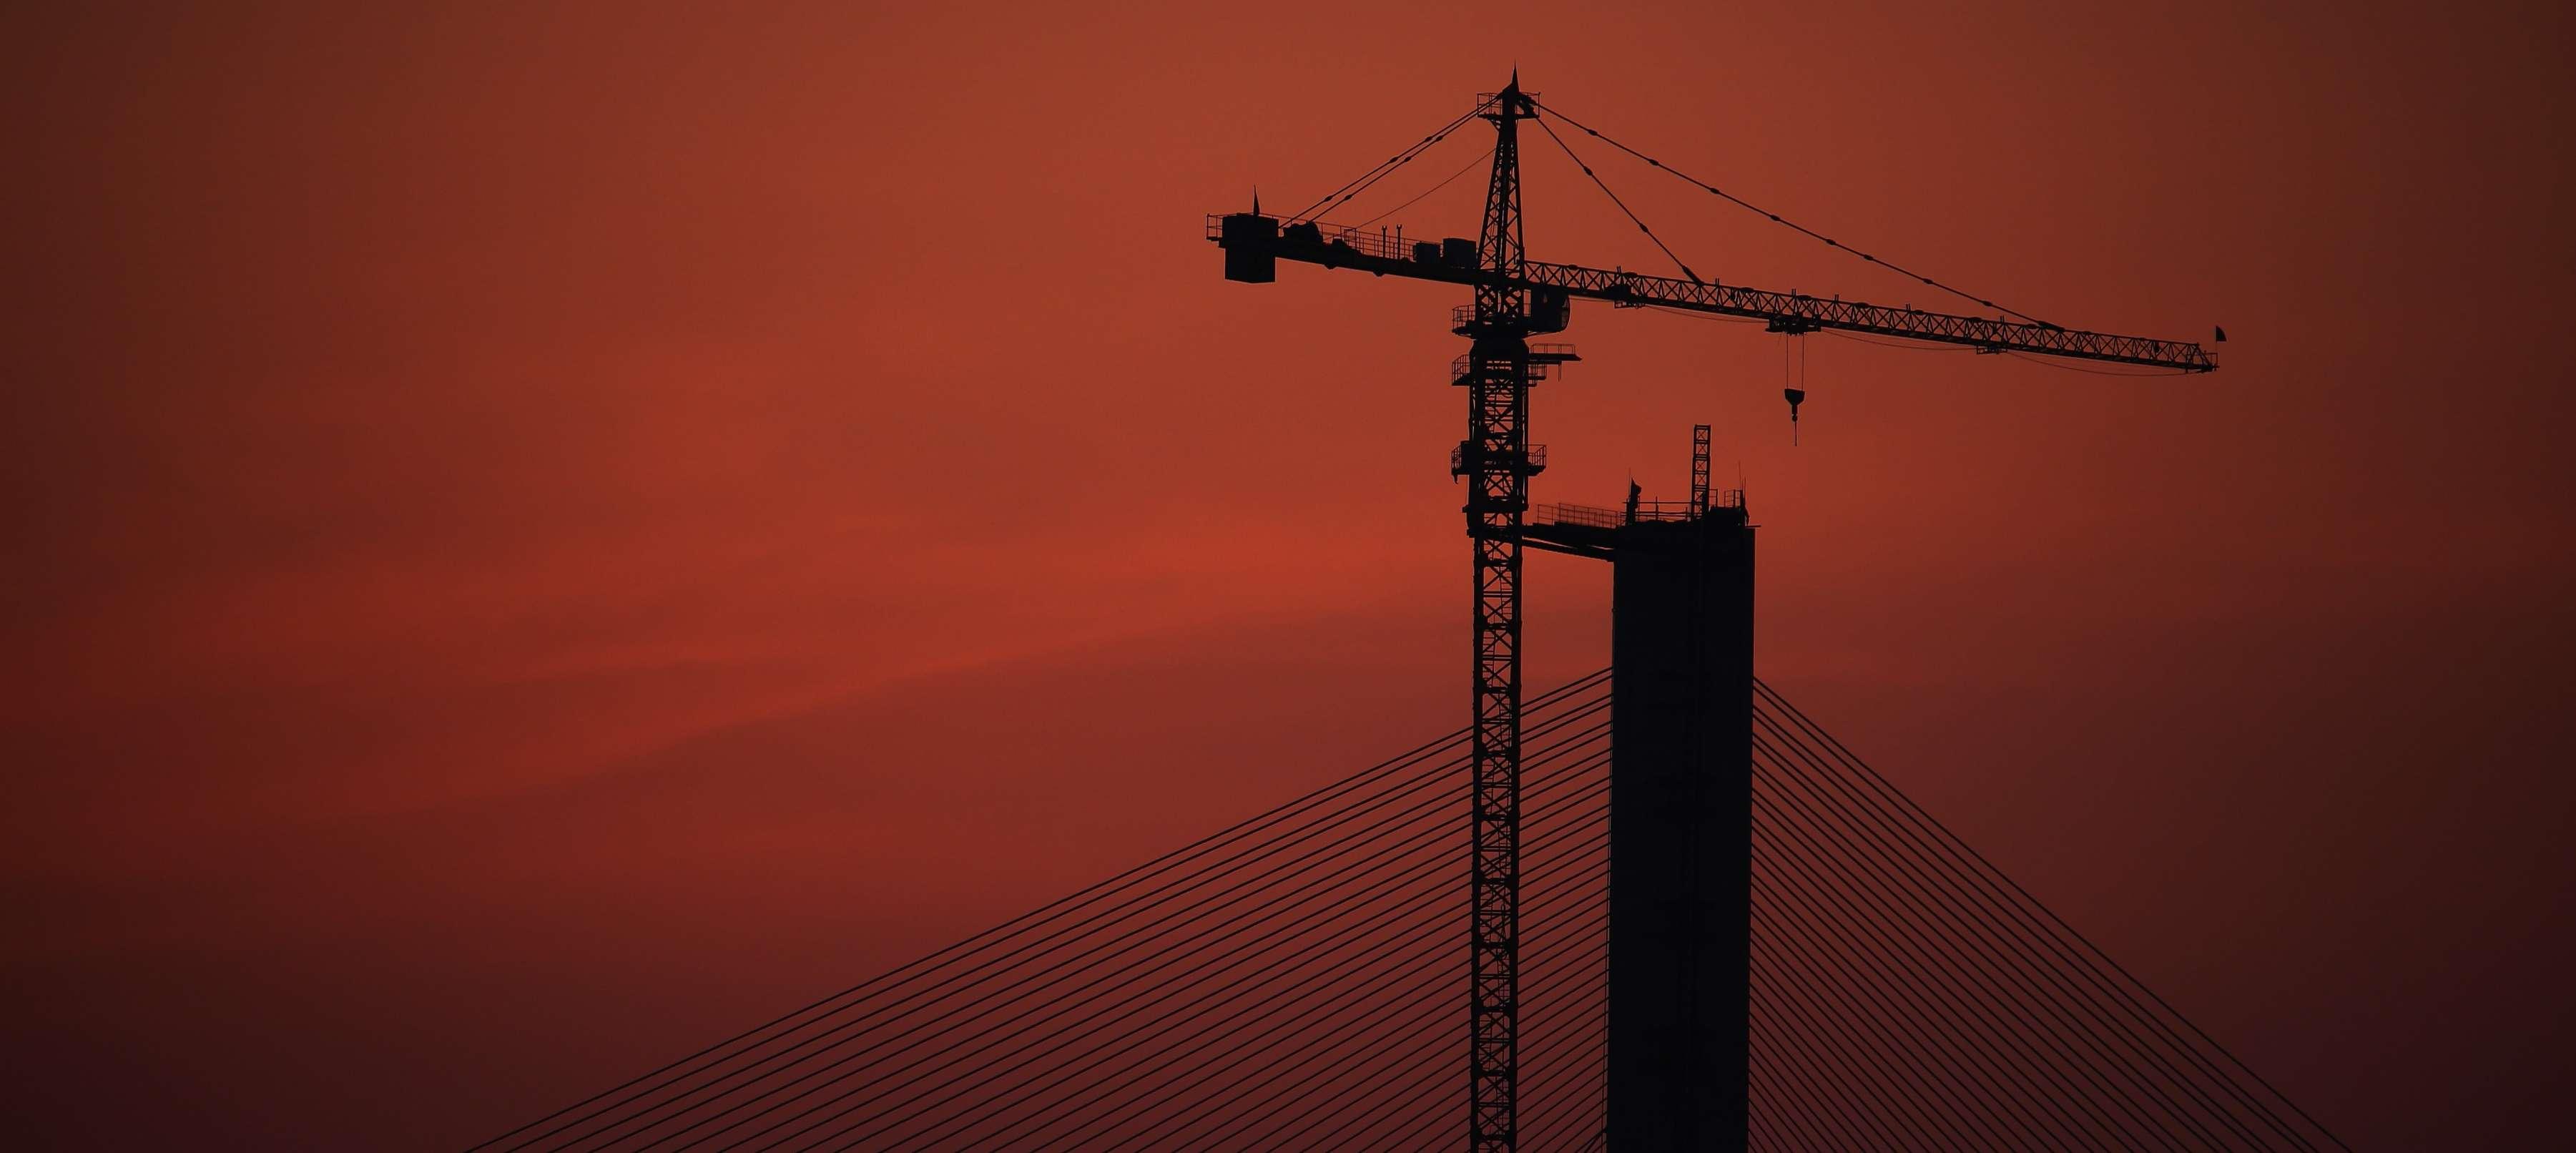 Construction working crane